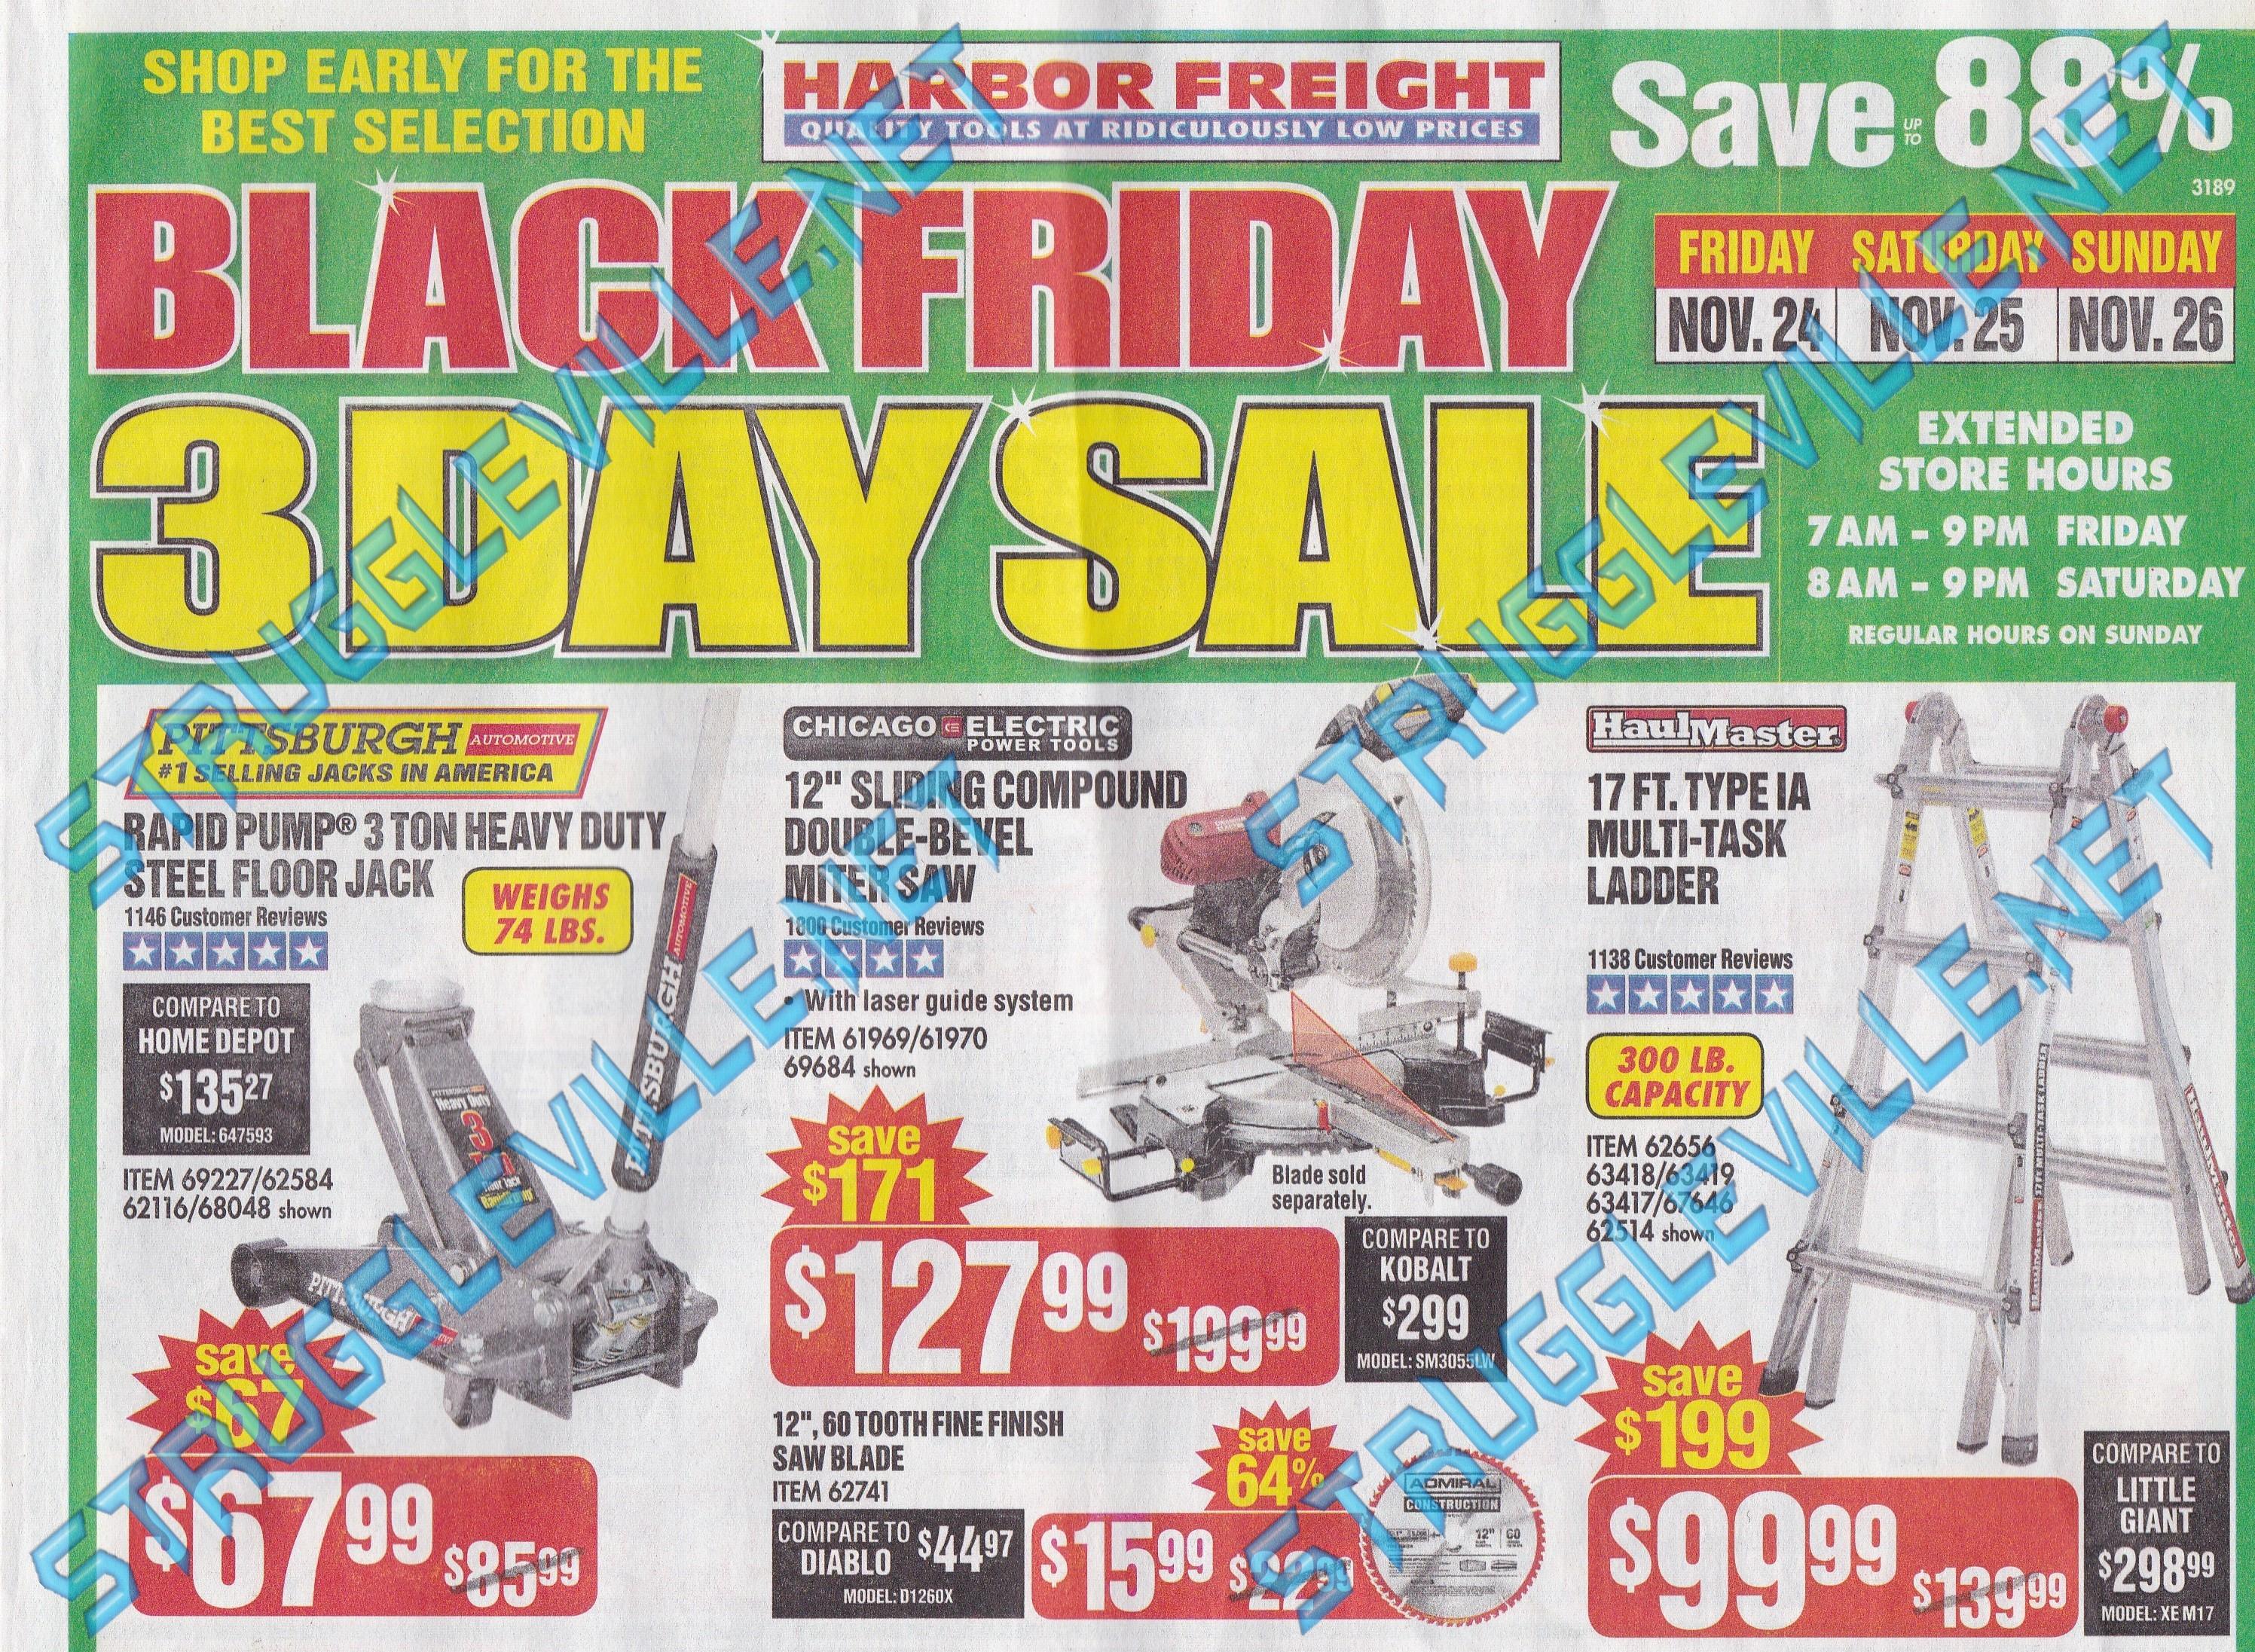 Groovy Harbor Freight Black Friday Ad 2017 Struggleville Uwap Interior Chair Design Uwaporg